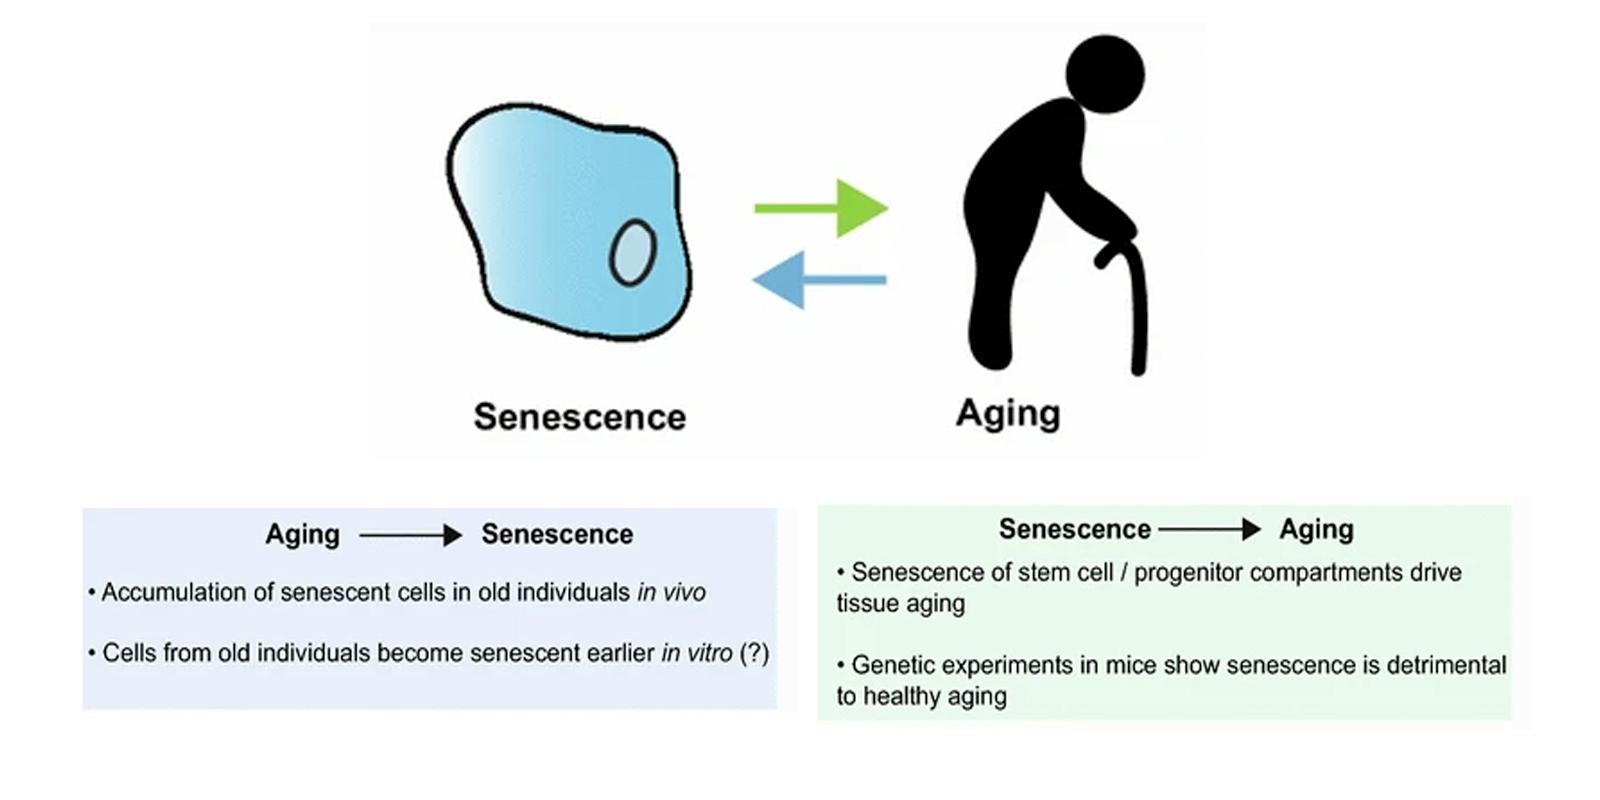 20-CEP-15480-senescence-aging-4